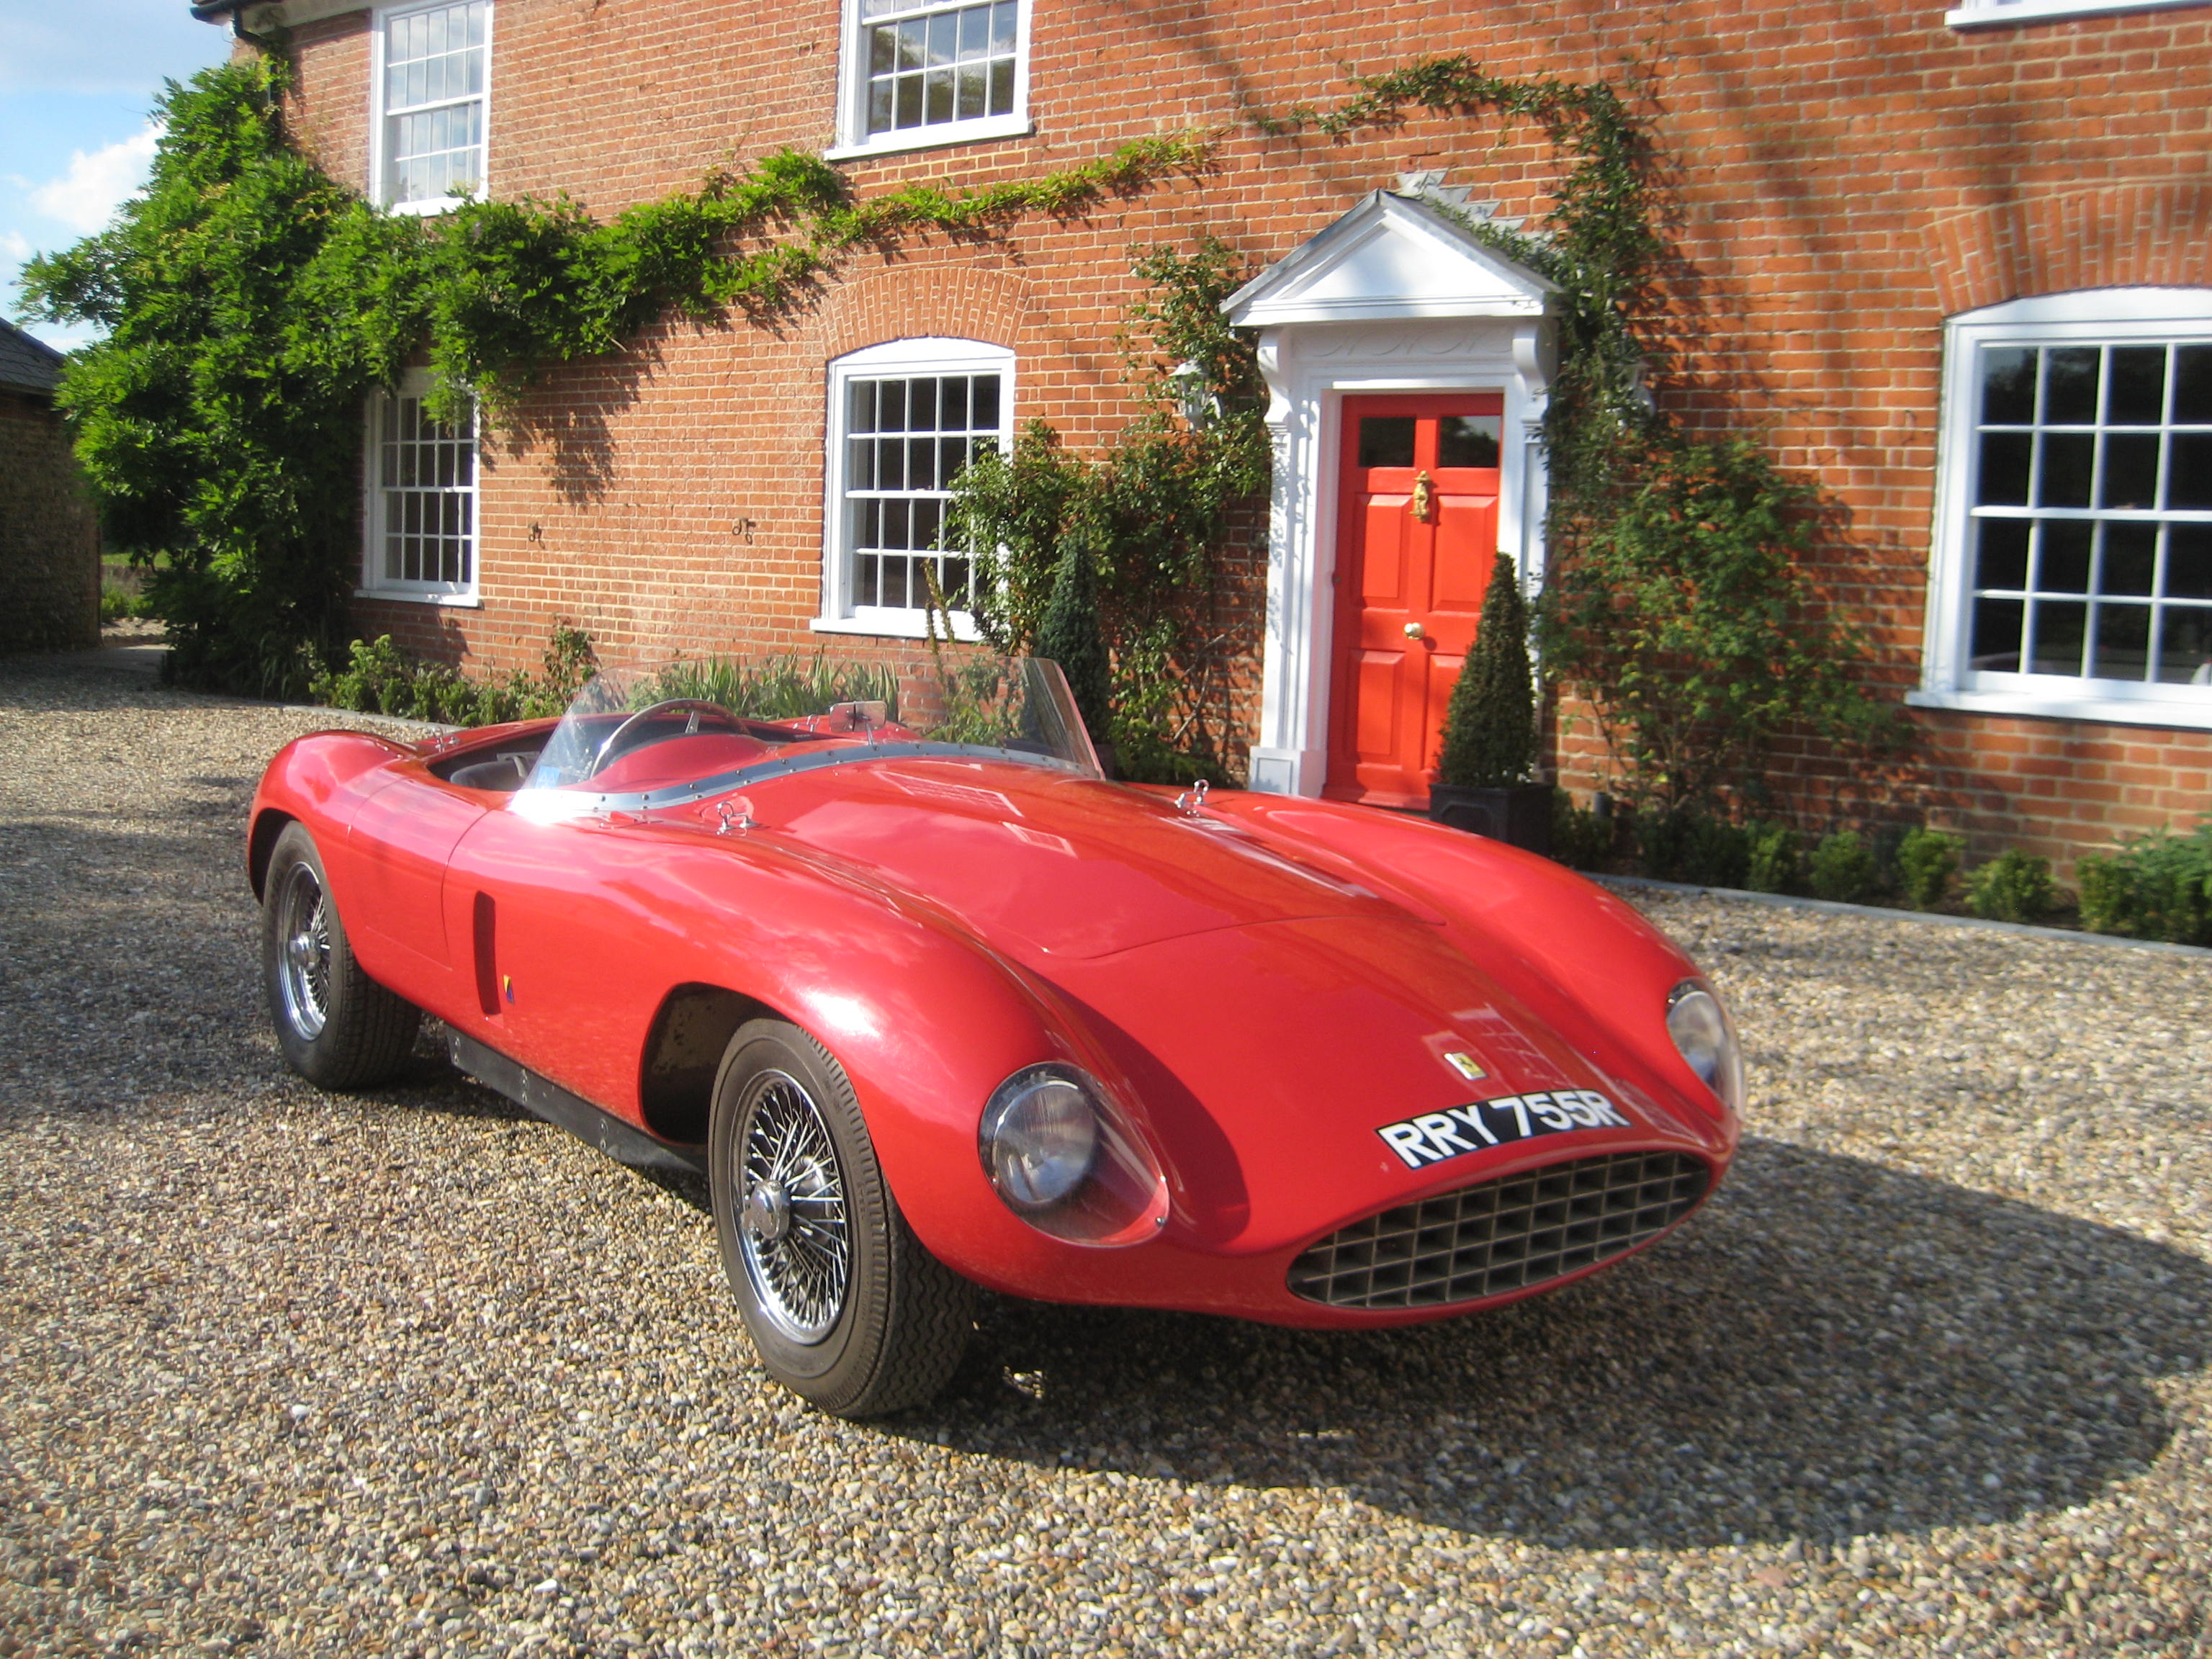 Classic car at Kersey Mill